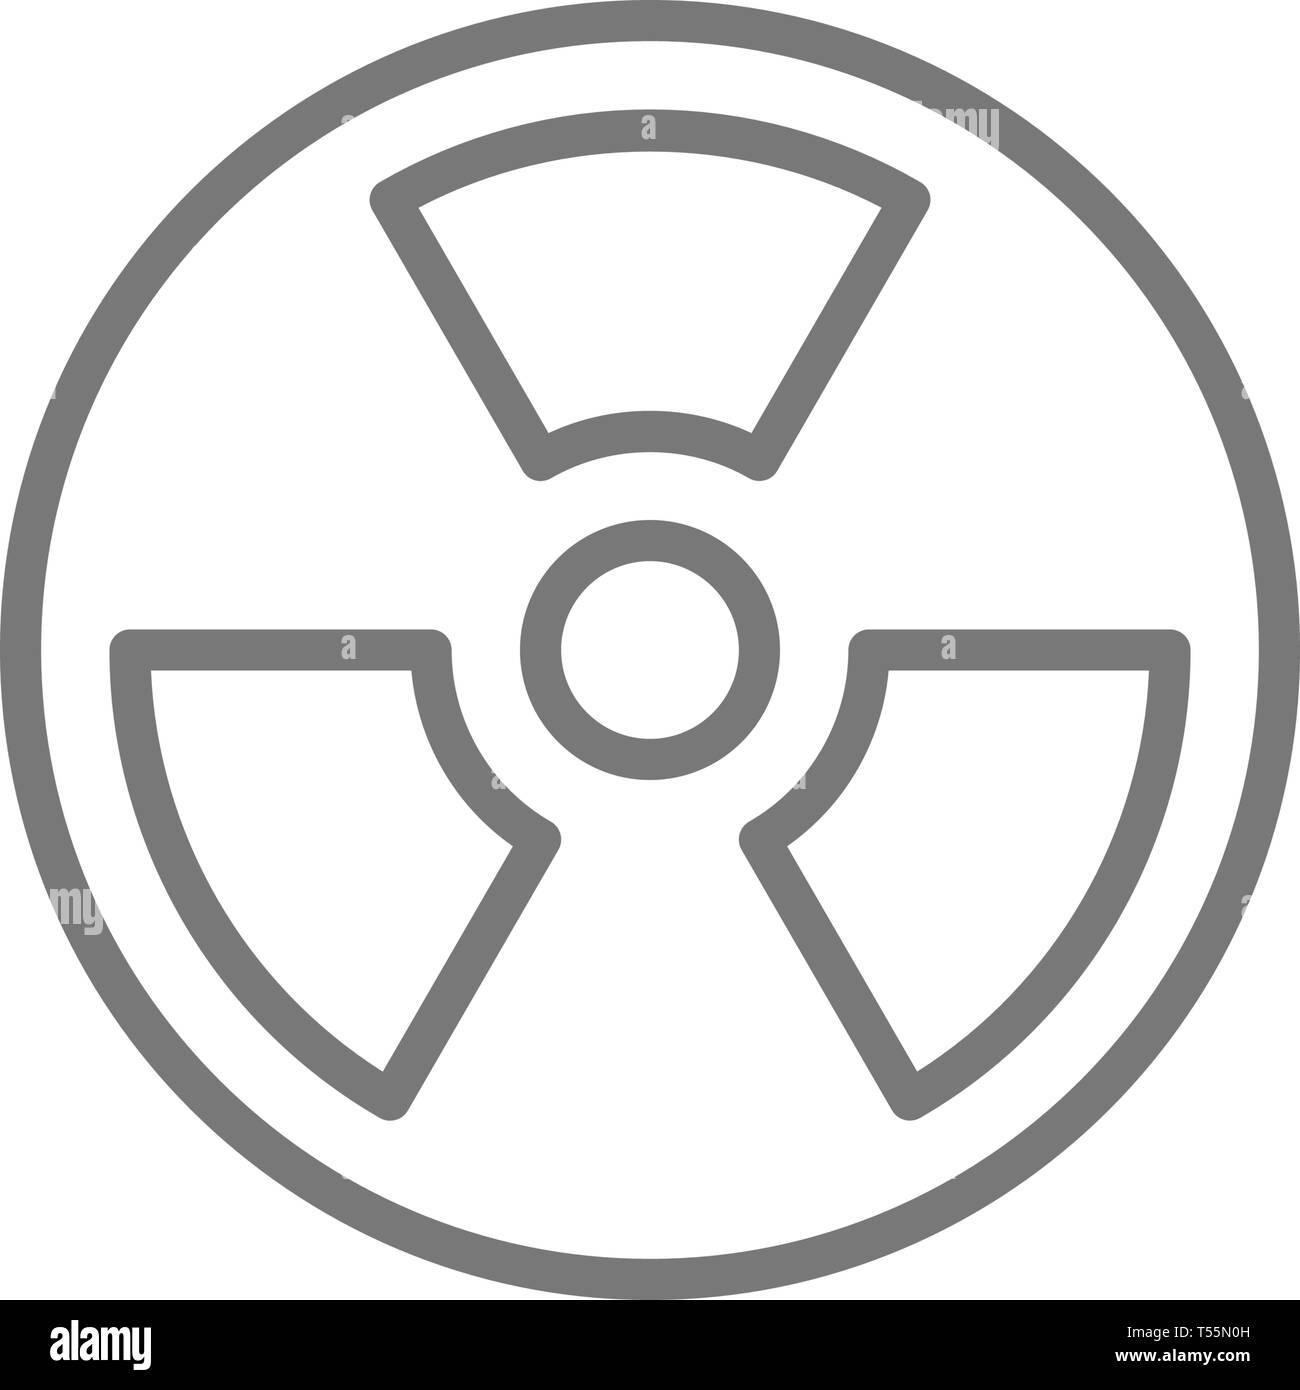 Radiation hazard sign line icon. - Stock Vector